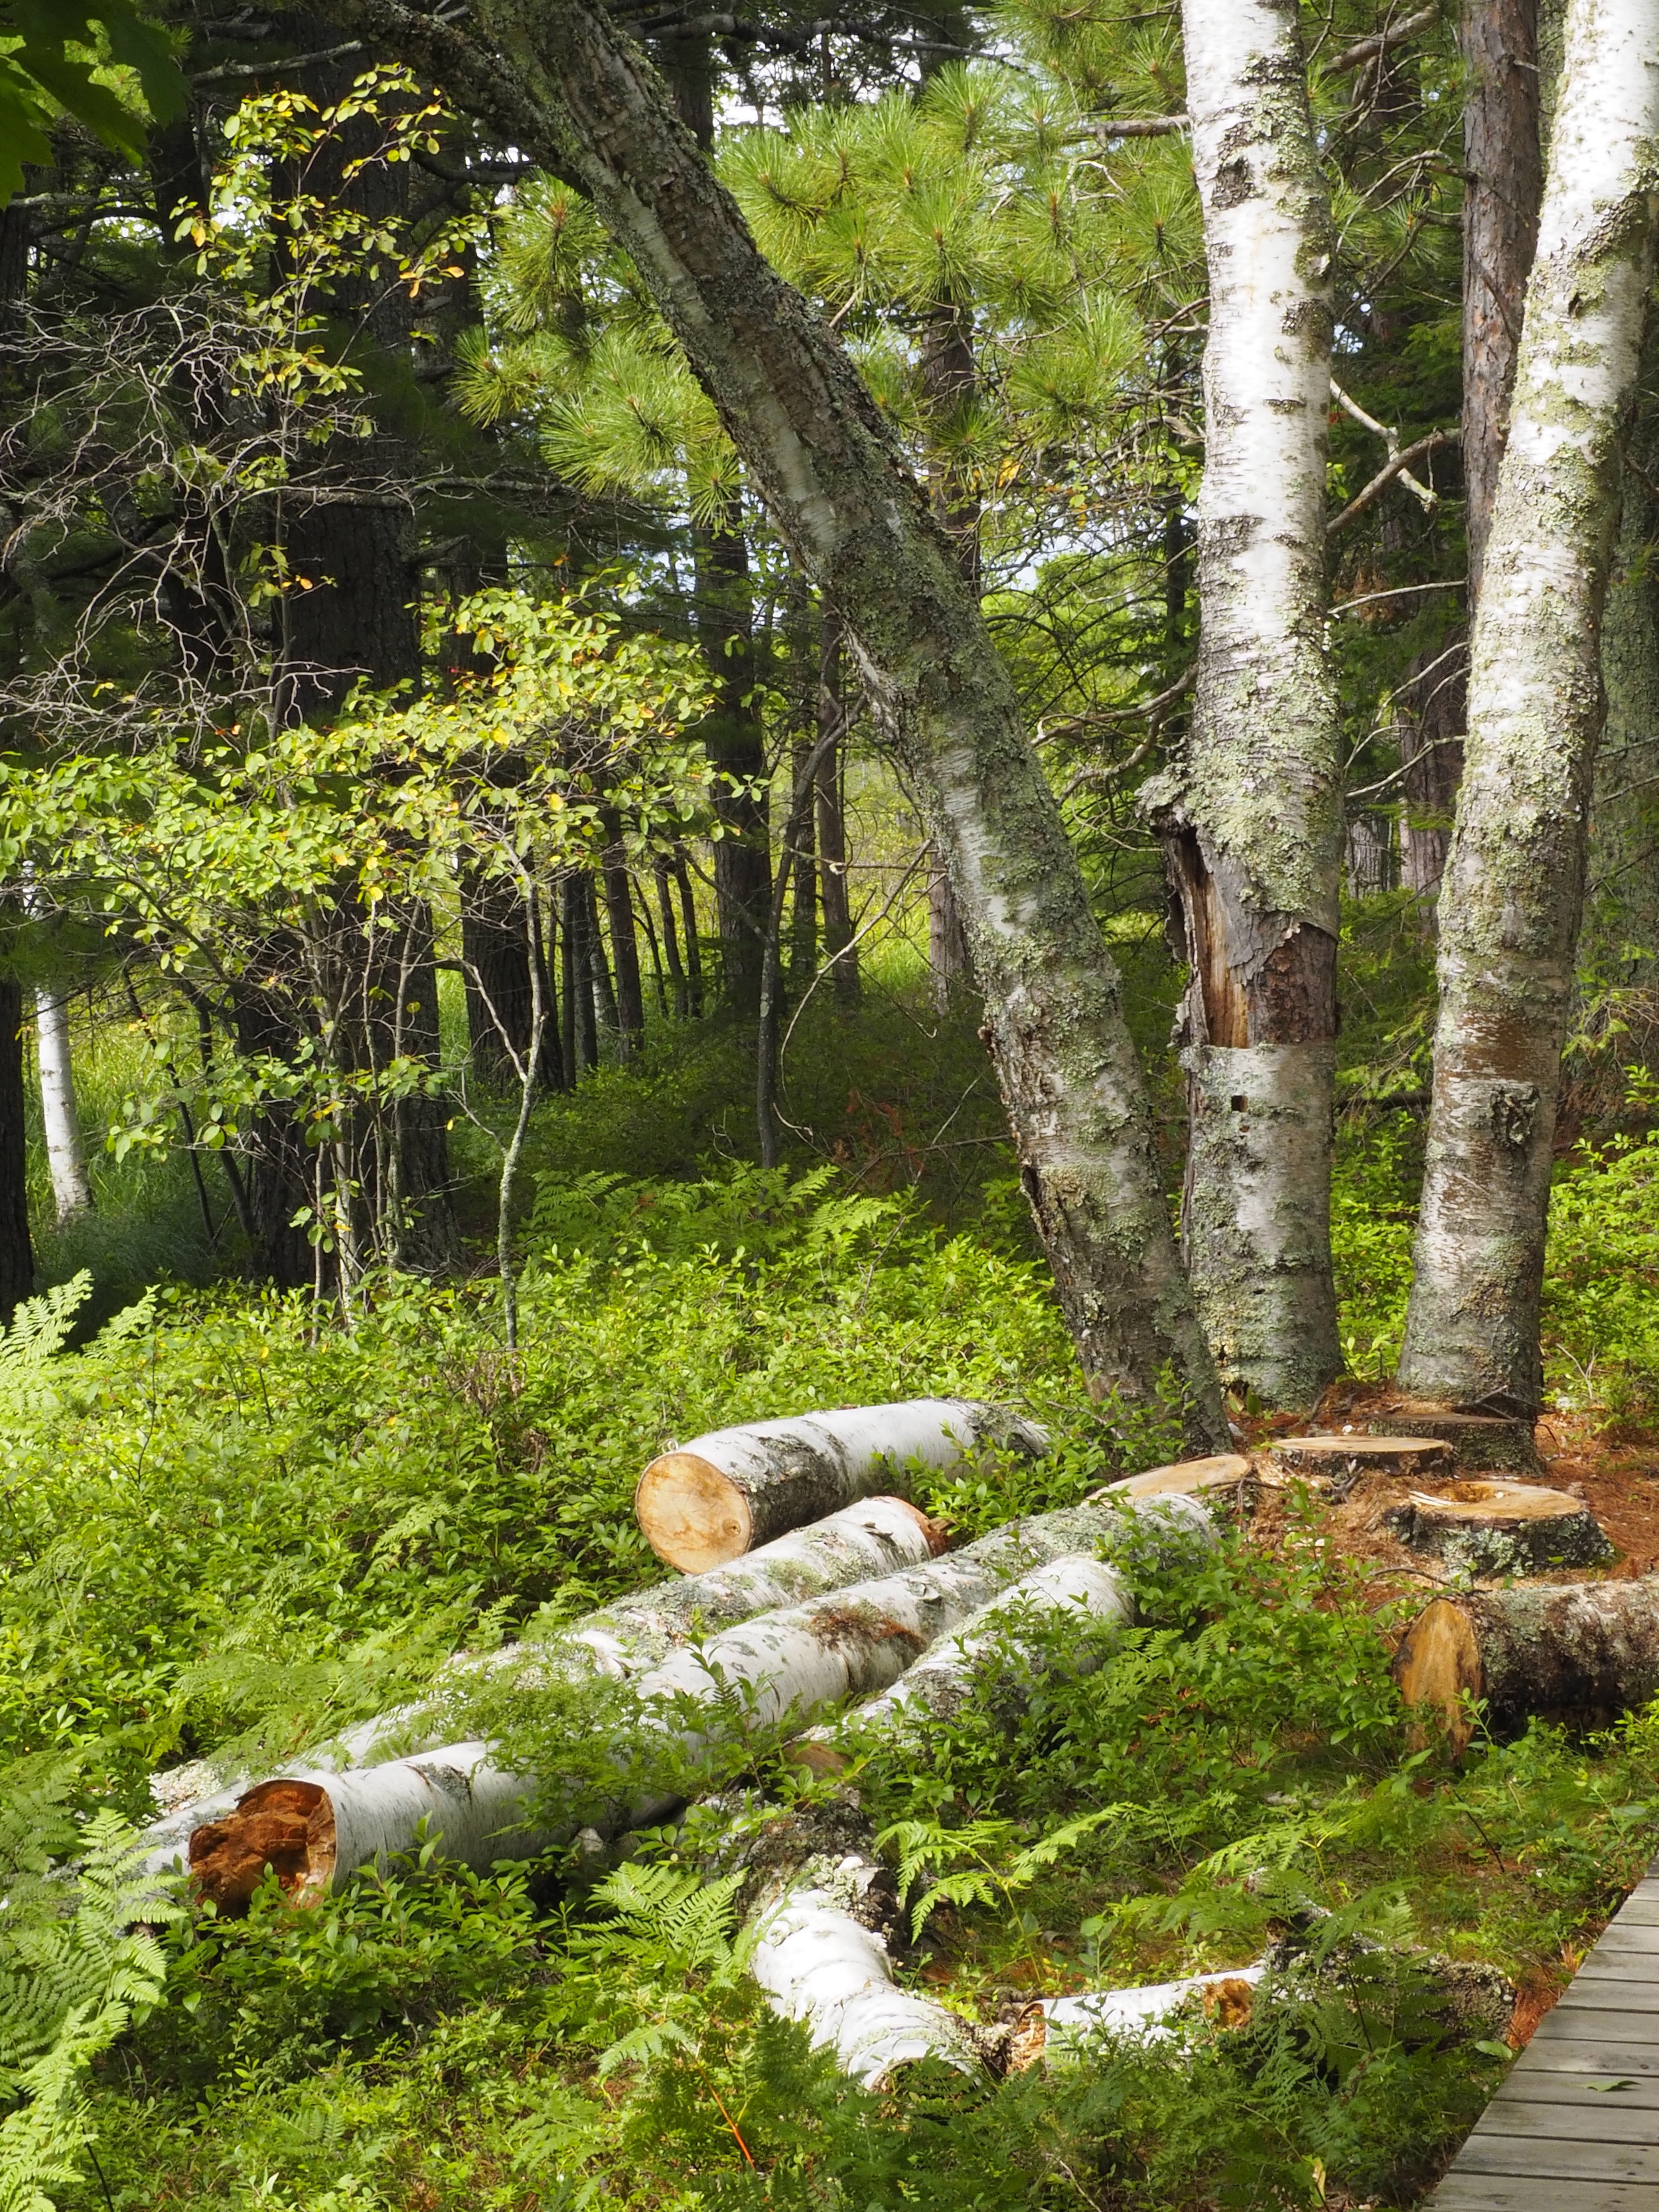 cindi_Madeline_NationalForest_Bog_spiritedtable_photo07.jpg